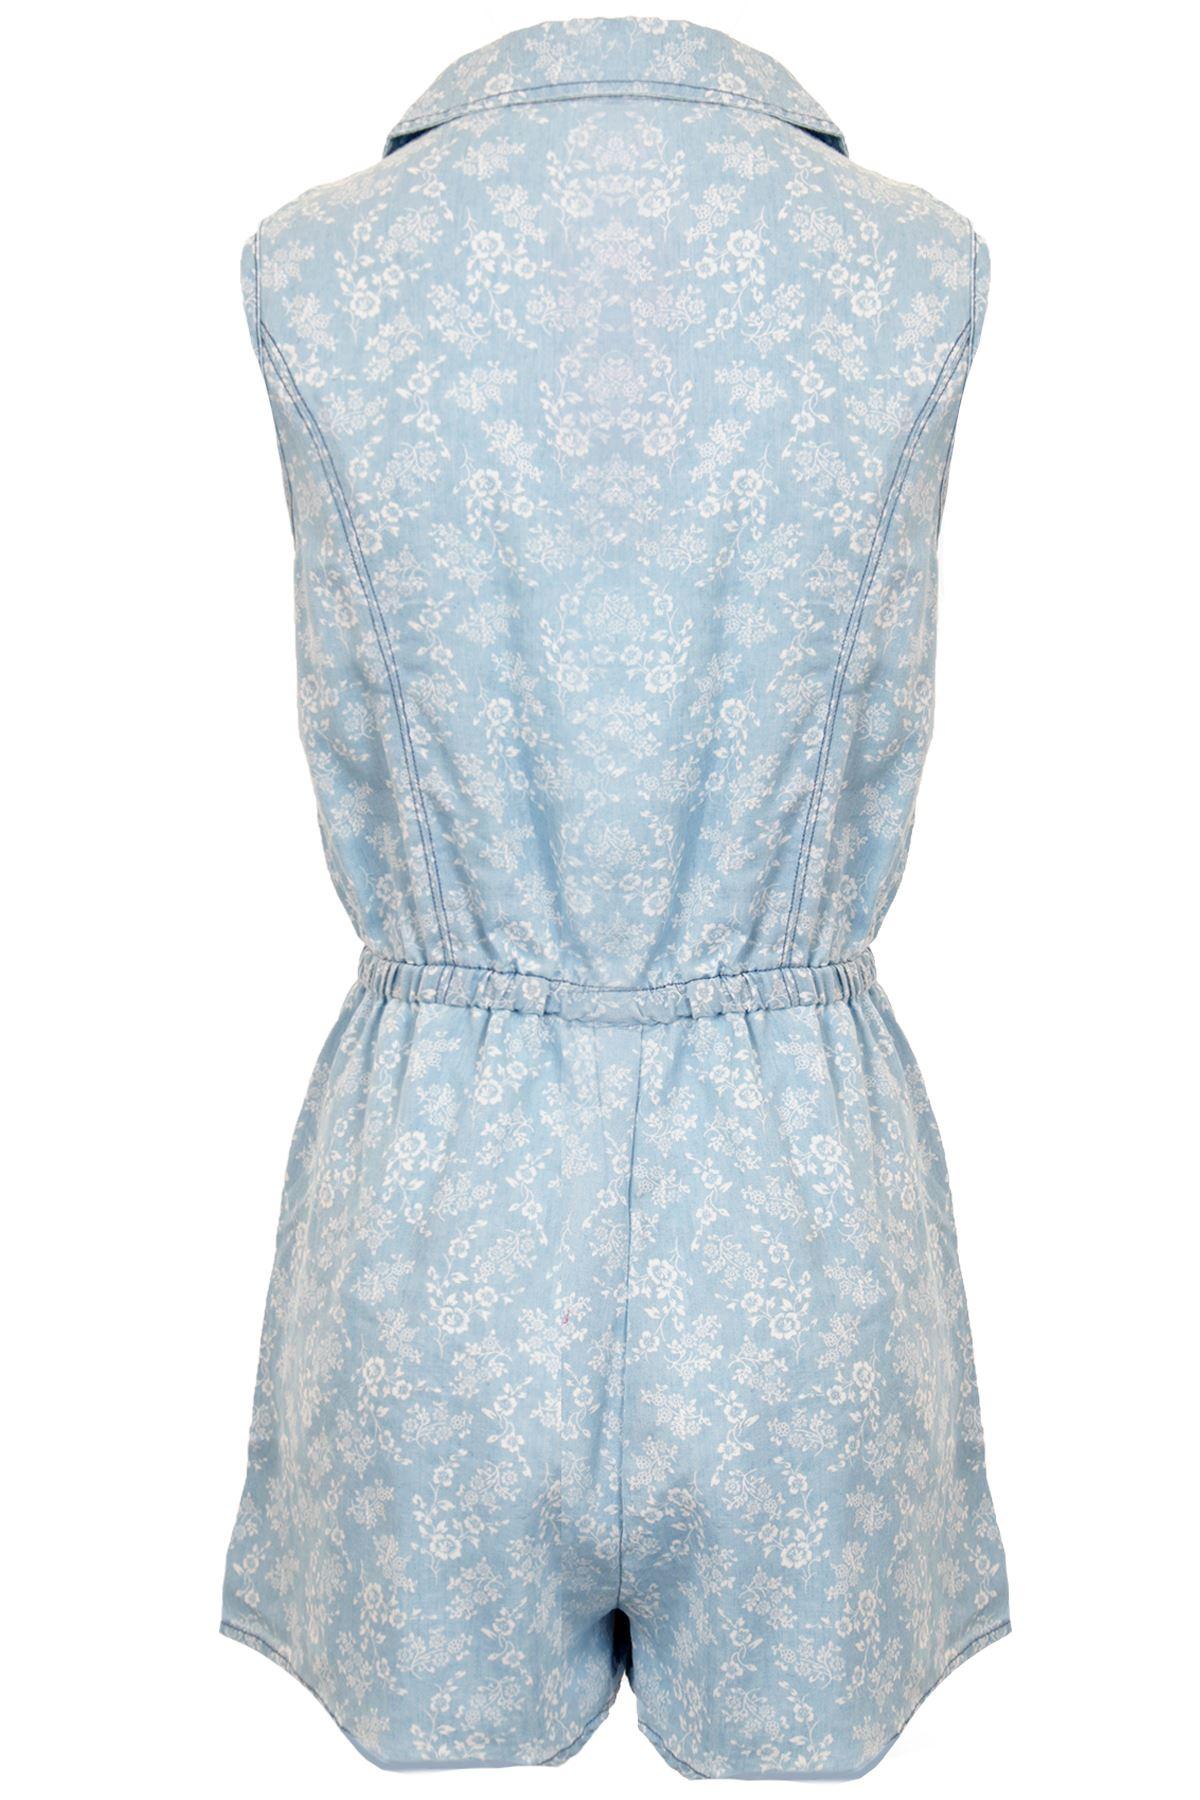 Ladies Denim Floral Print Pattern Shirt Collar Pockets Women/'s Playsuit  6-14